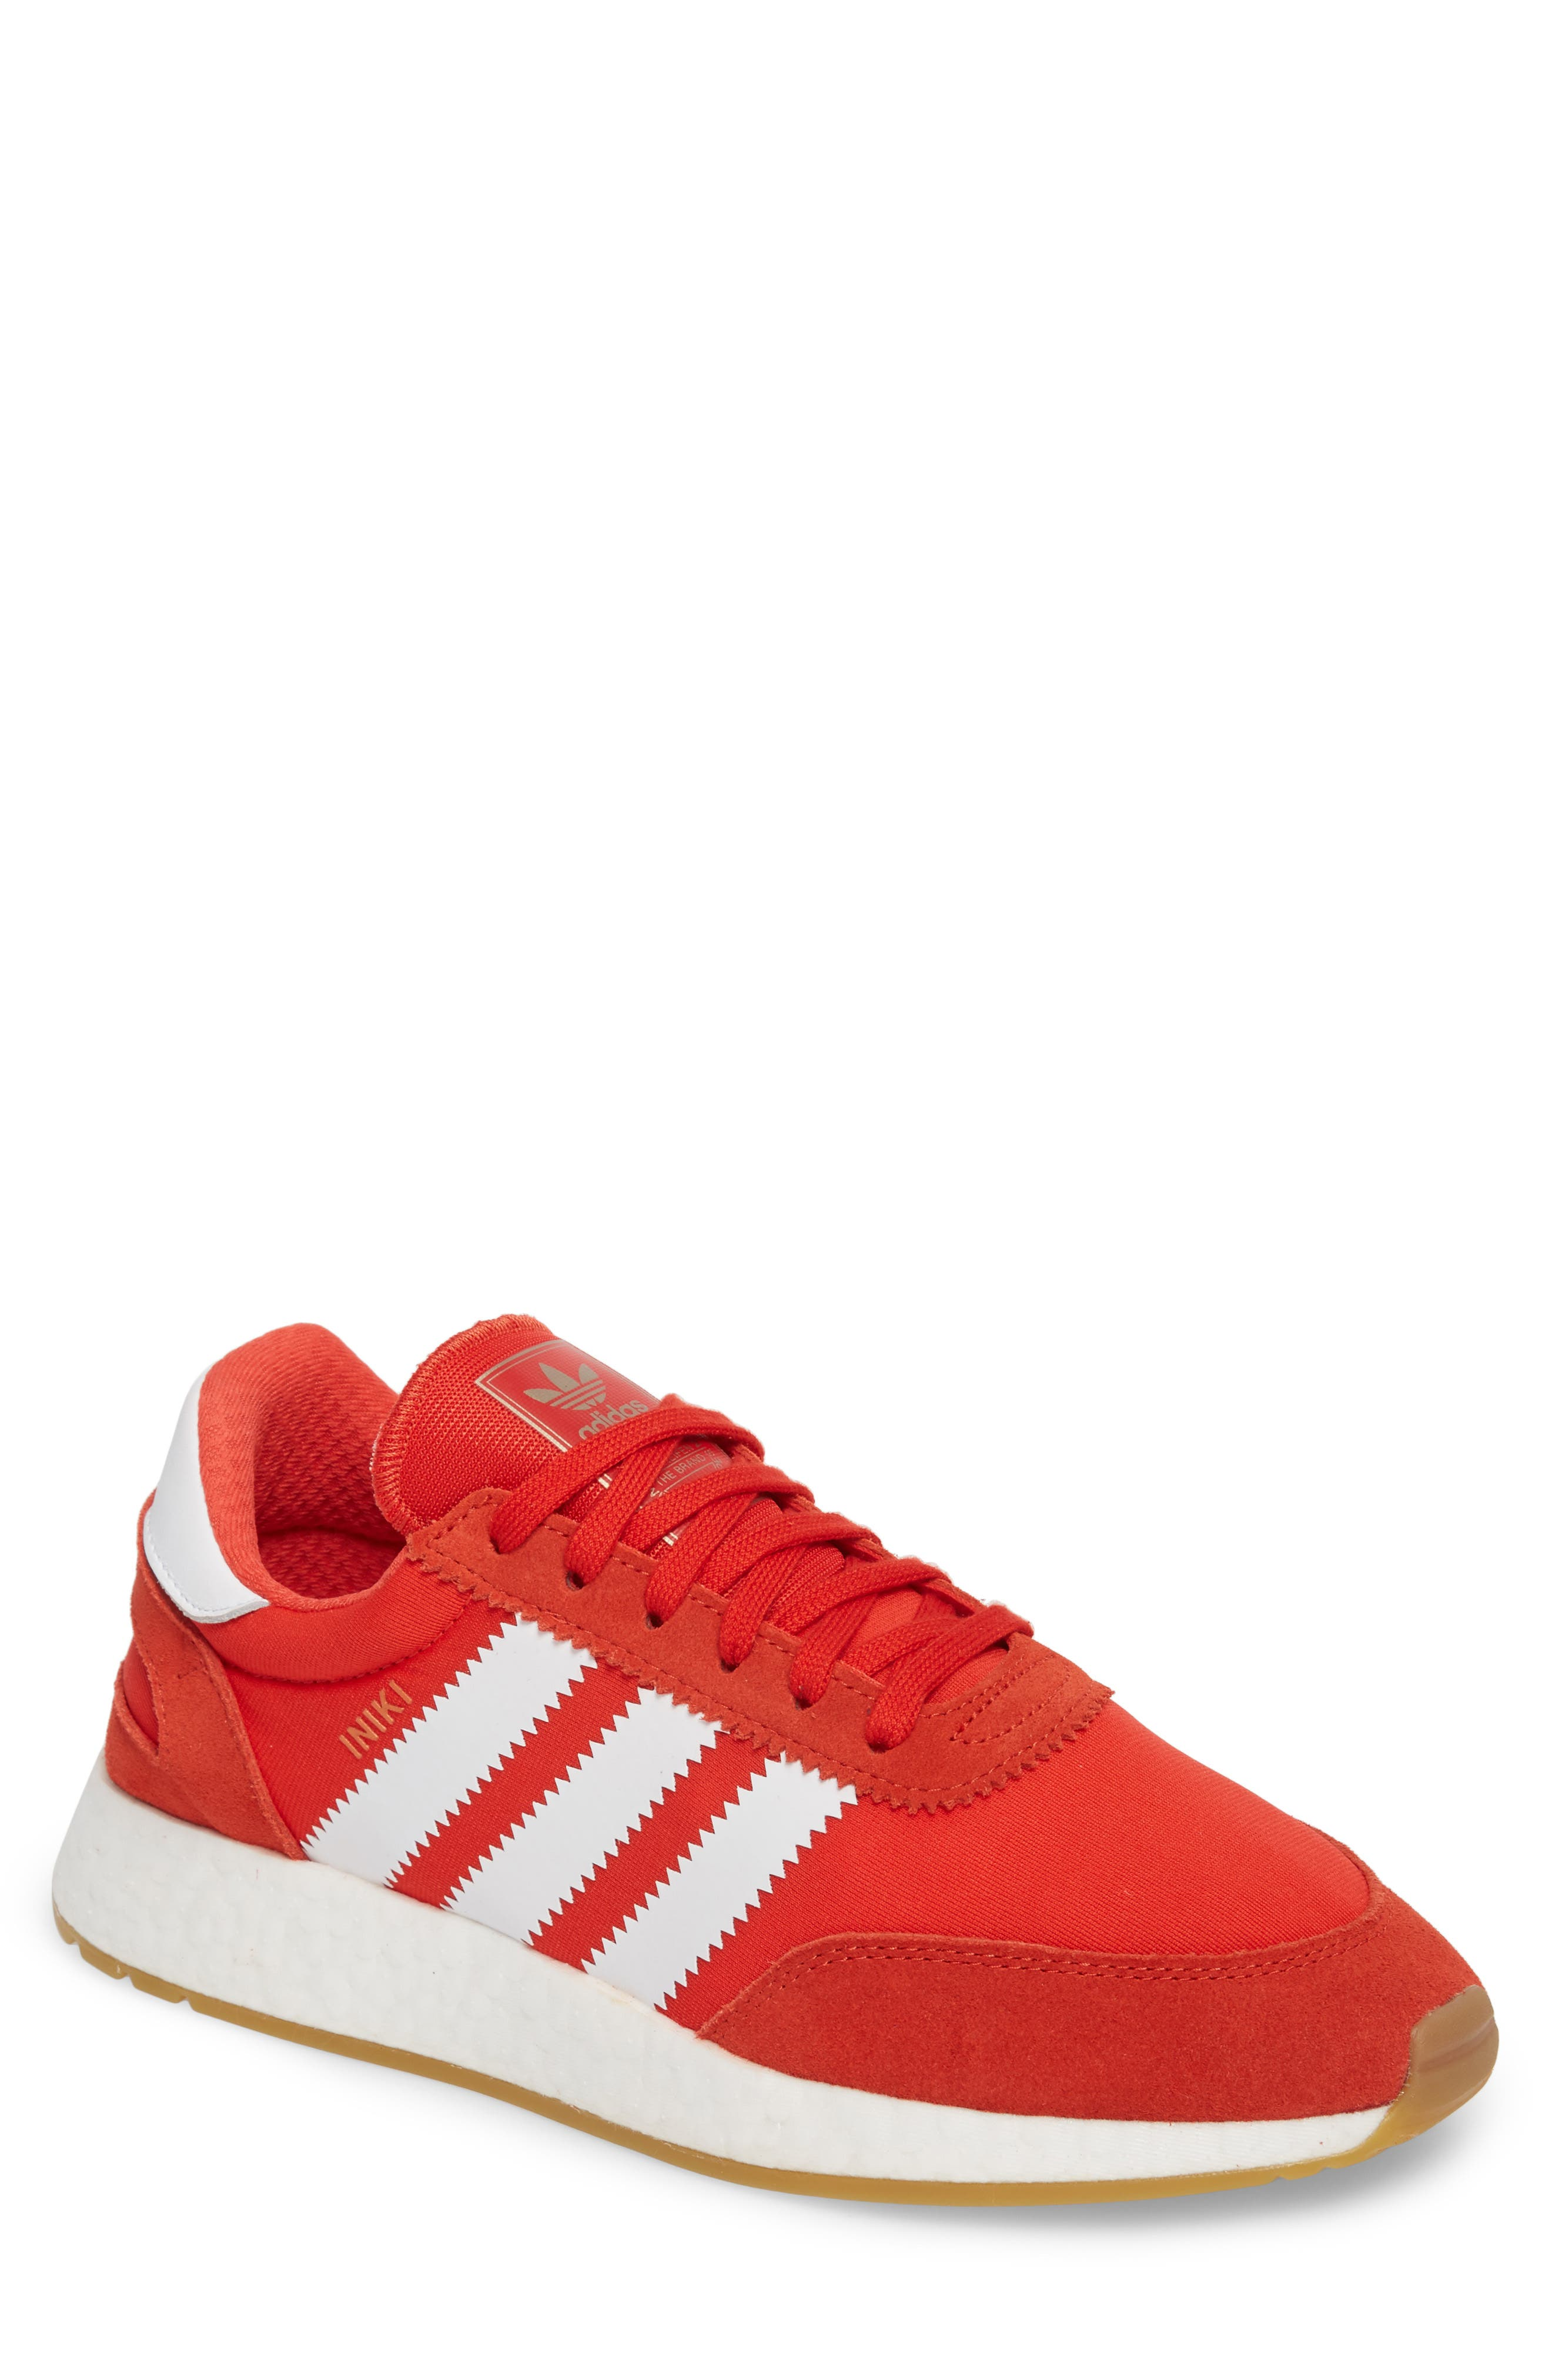 Iniki Running Shoe,                             Main thumbnail 1, color,                             Red/ White/ Gum